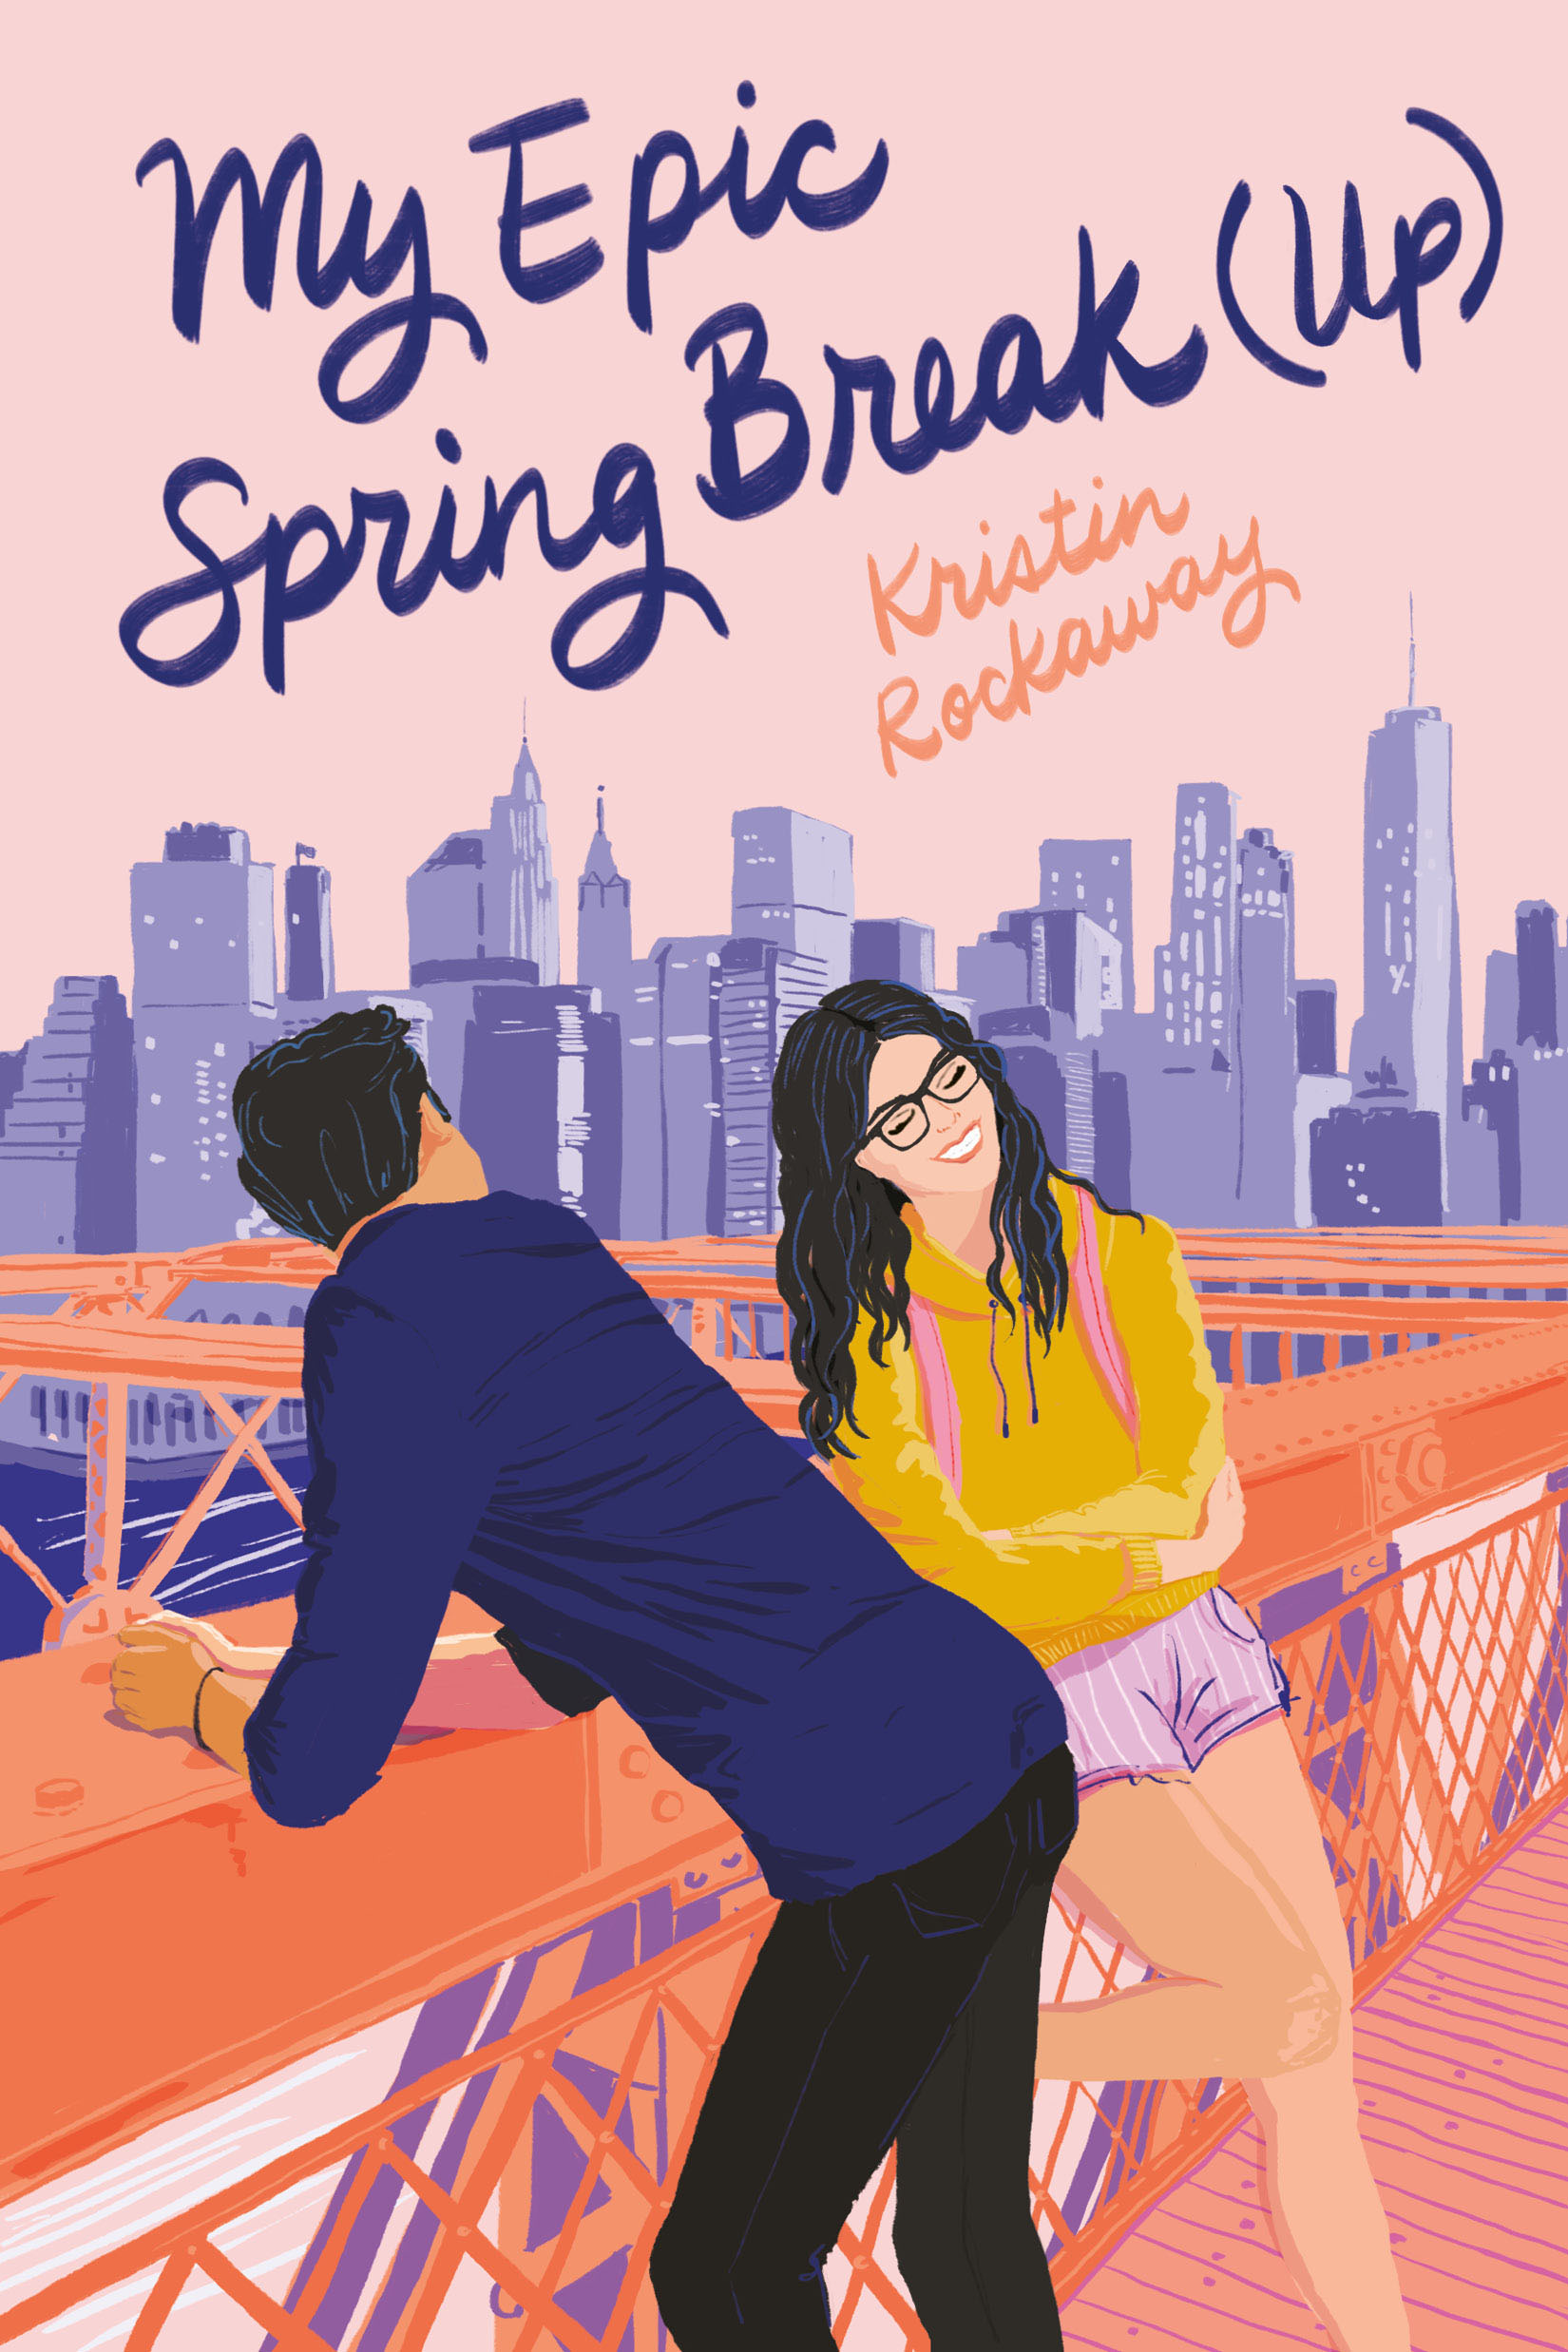 Book Review: My Epic Spring Break (Up) by Kristin Rockaway